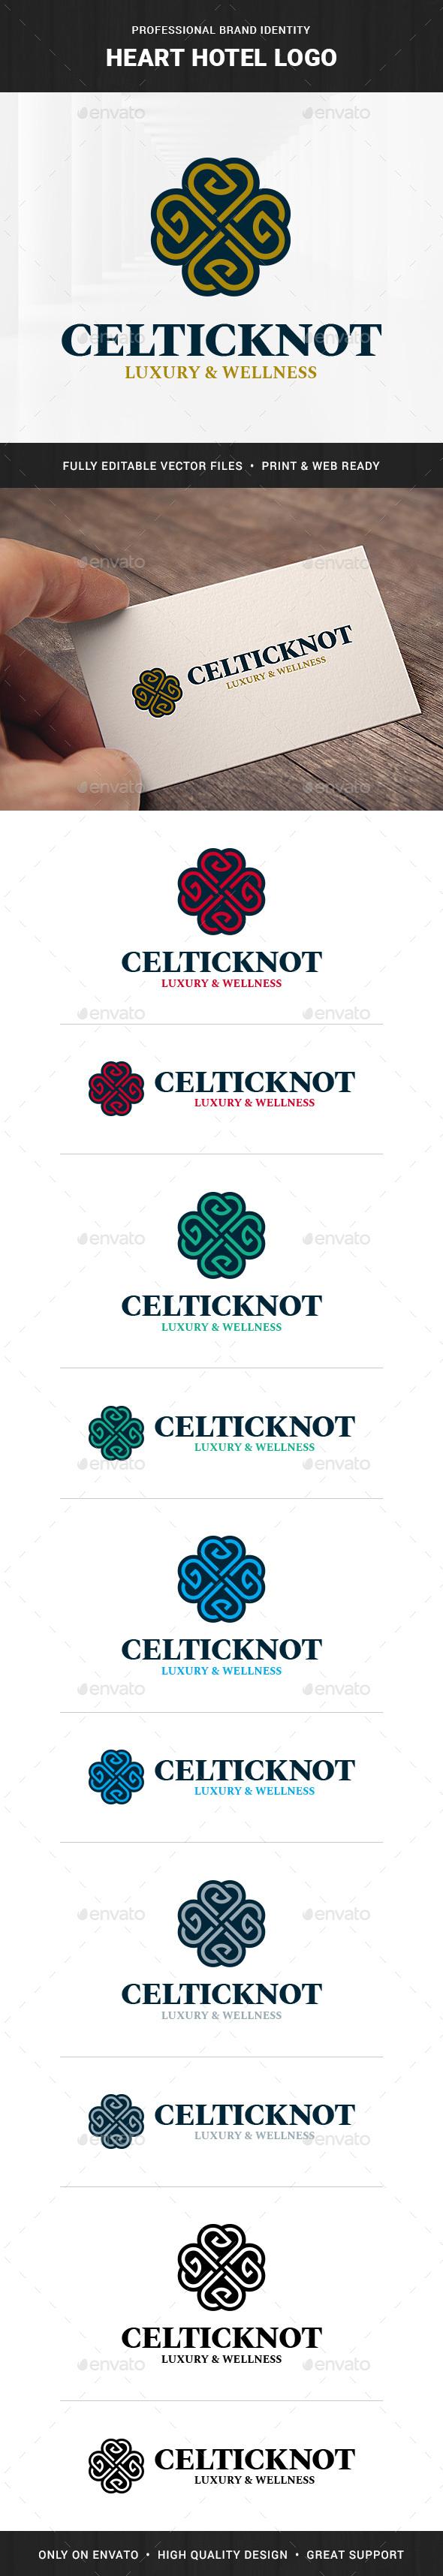 Heart Hotel Logo Template